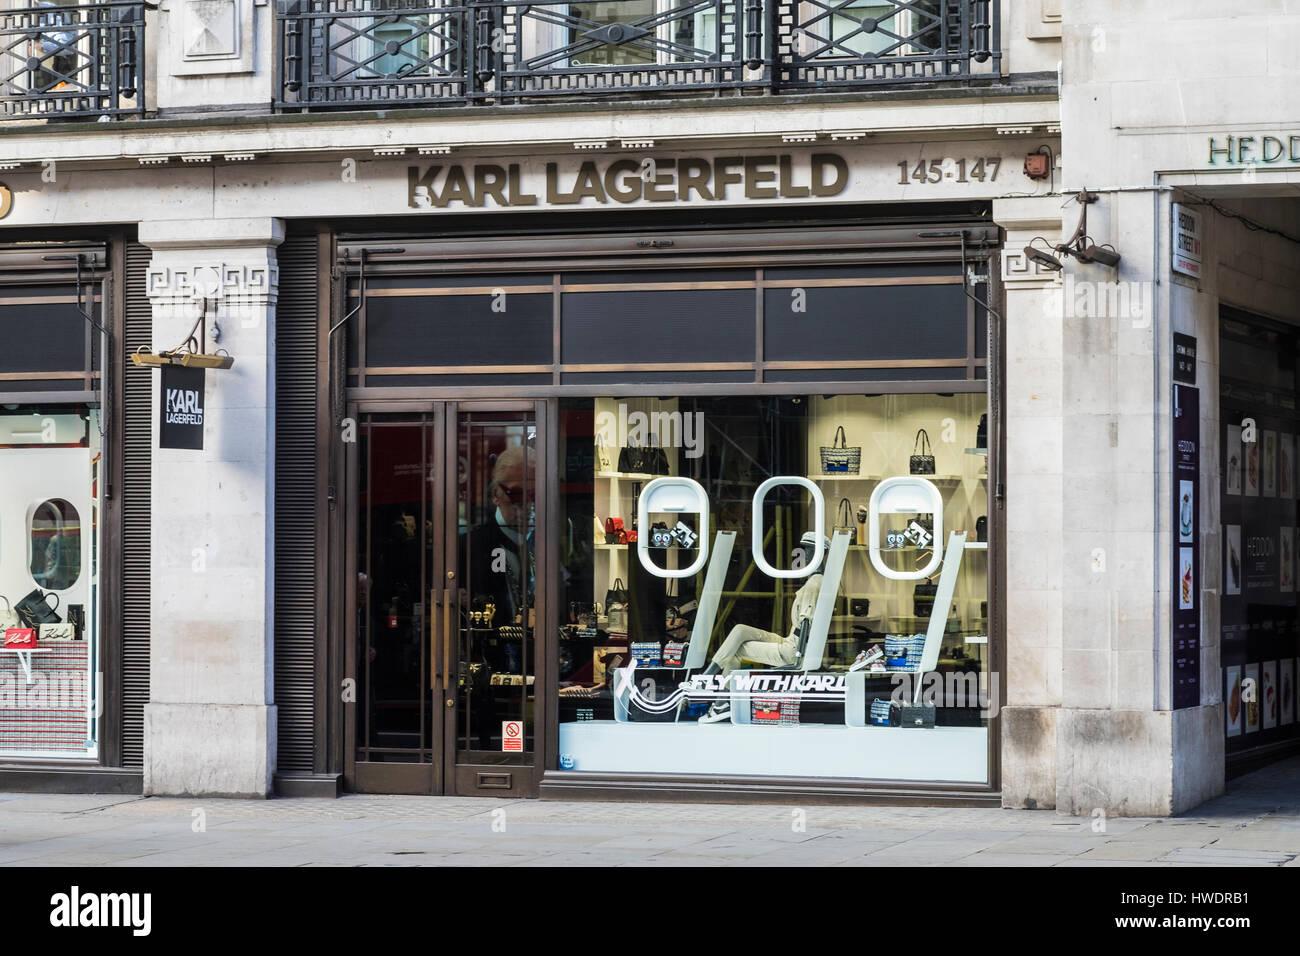 karl lagerfeld store regent street london england u k. Black Bedroom Furniture Sets. Home Design Ideas